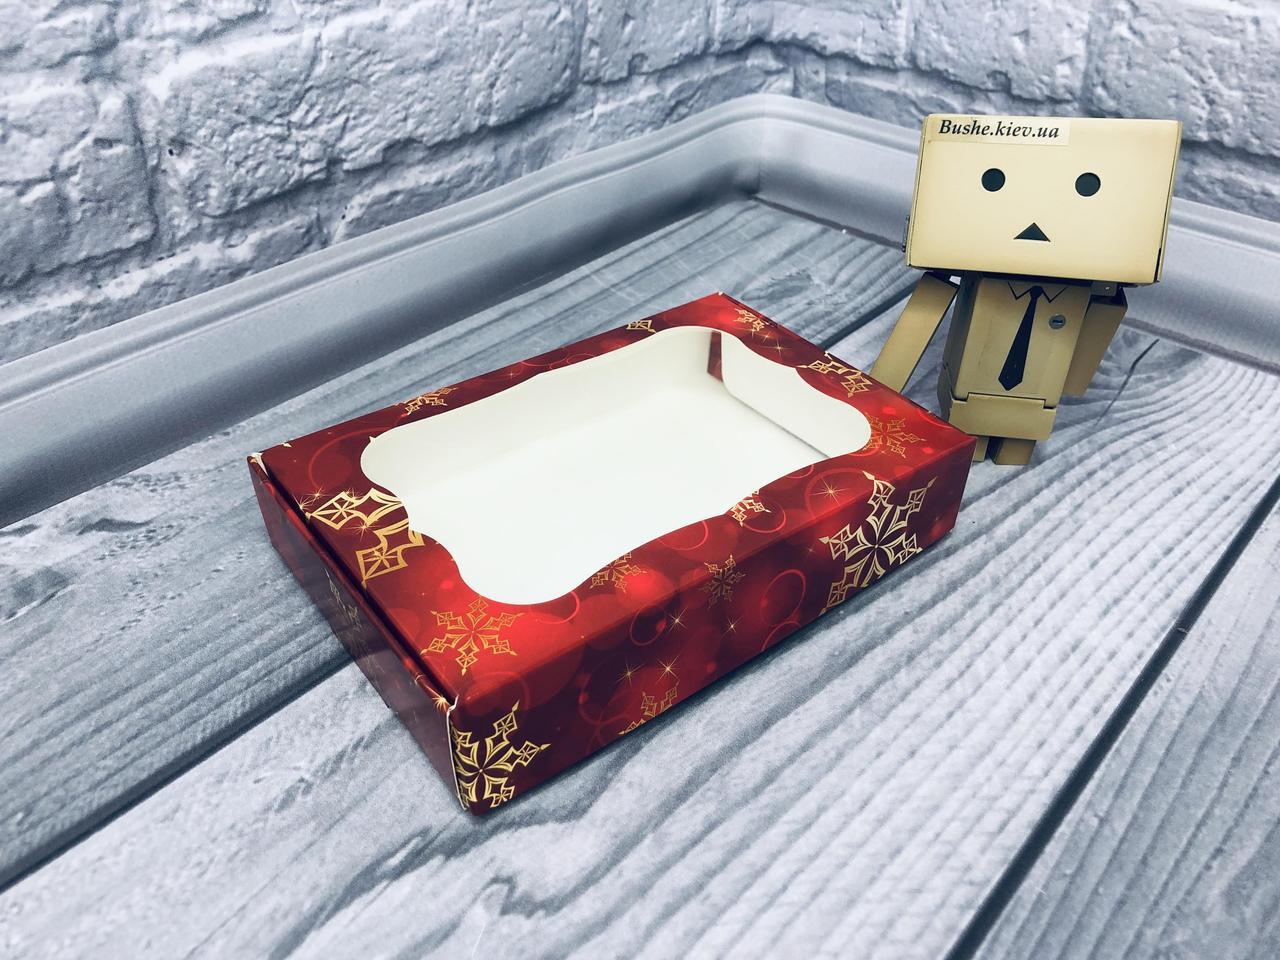 *10 шт* / Коробка для пряников / 100х150х30 мм / печать-Снег.Красн / окно-обычн / НГ